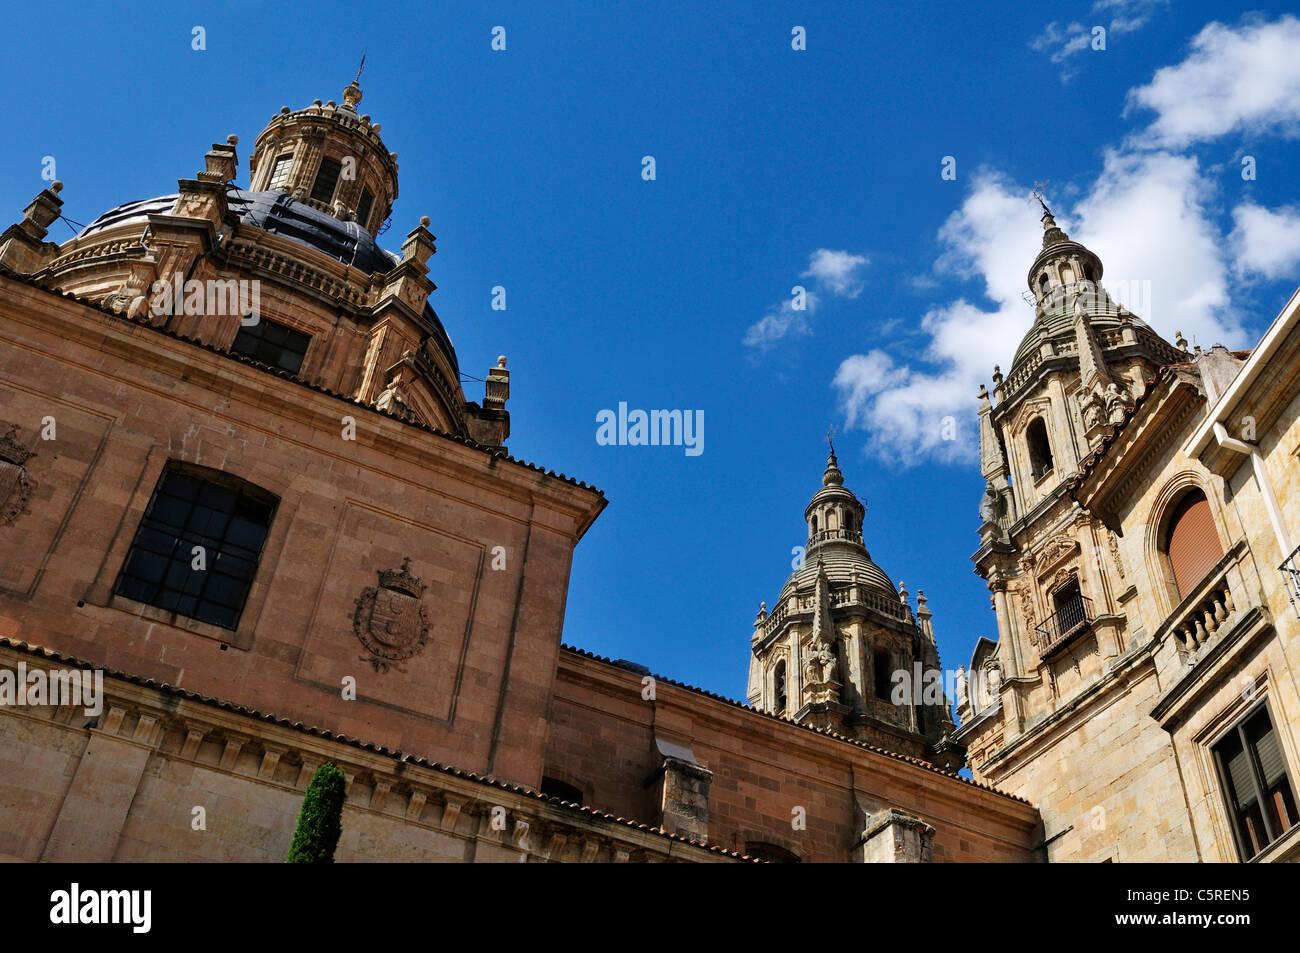 Europe, Spain, Castile and Leon, Salamanca, View of historic university - Stock Image